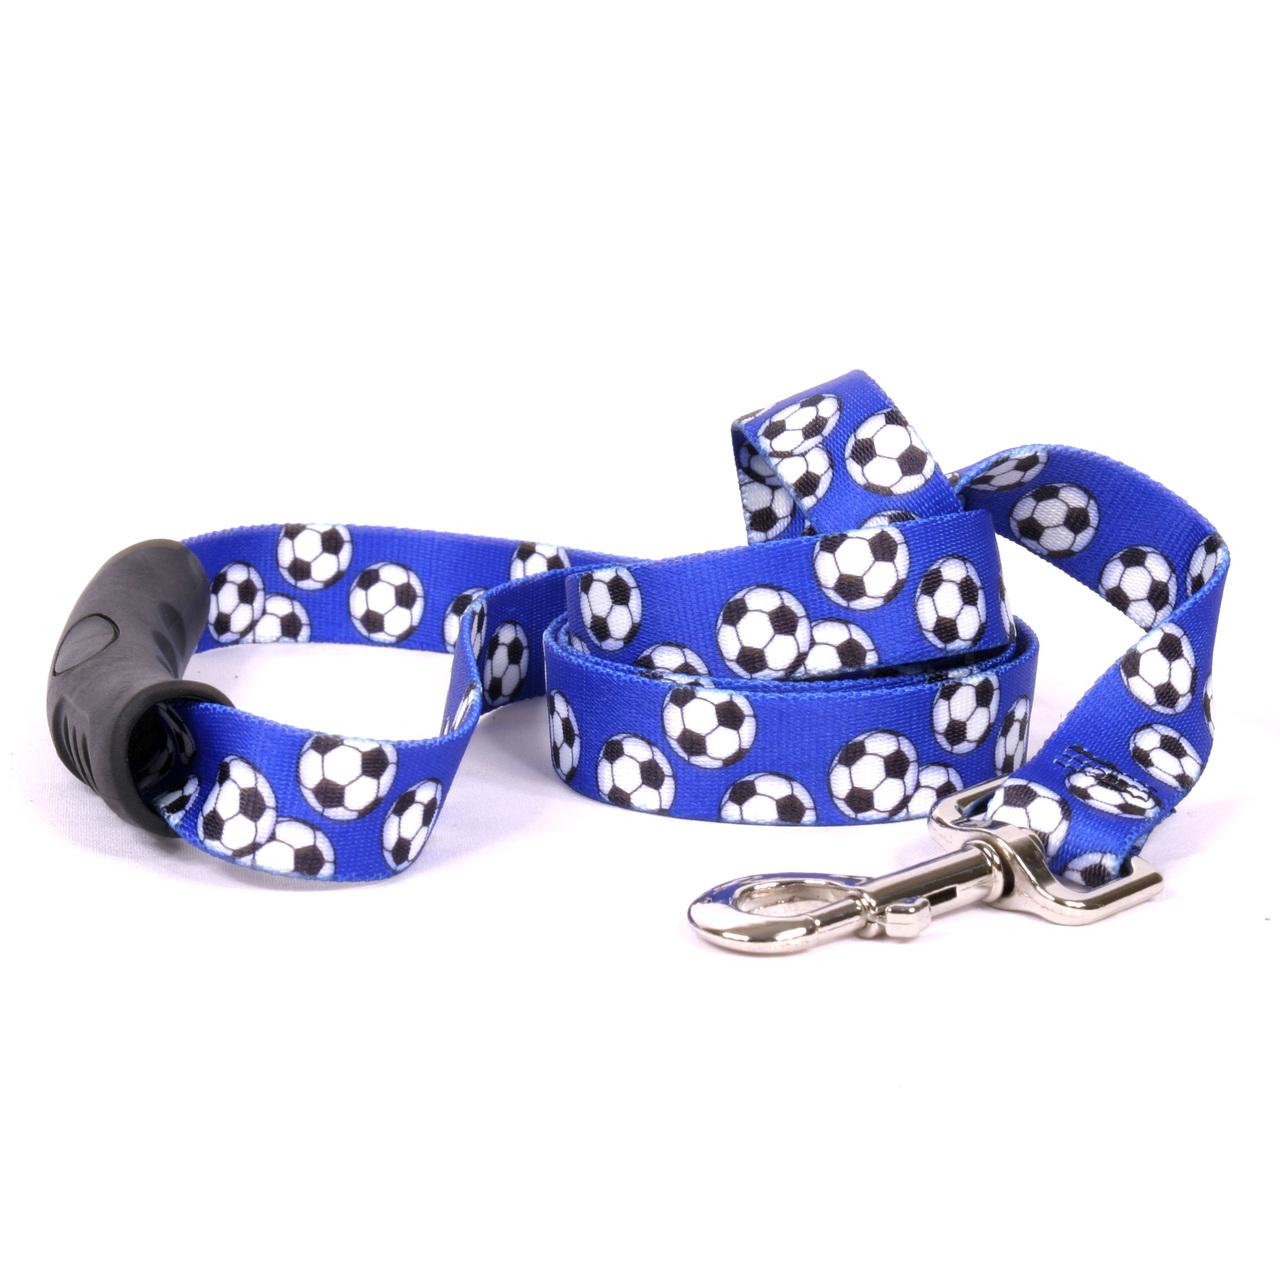 Yellow Dog Soccer Balls EZ-Grip Dog Leash